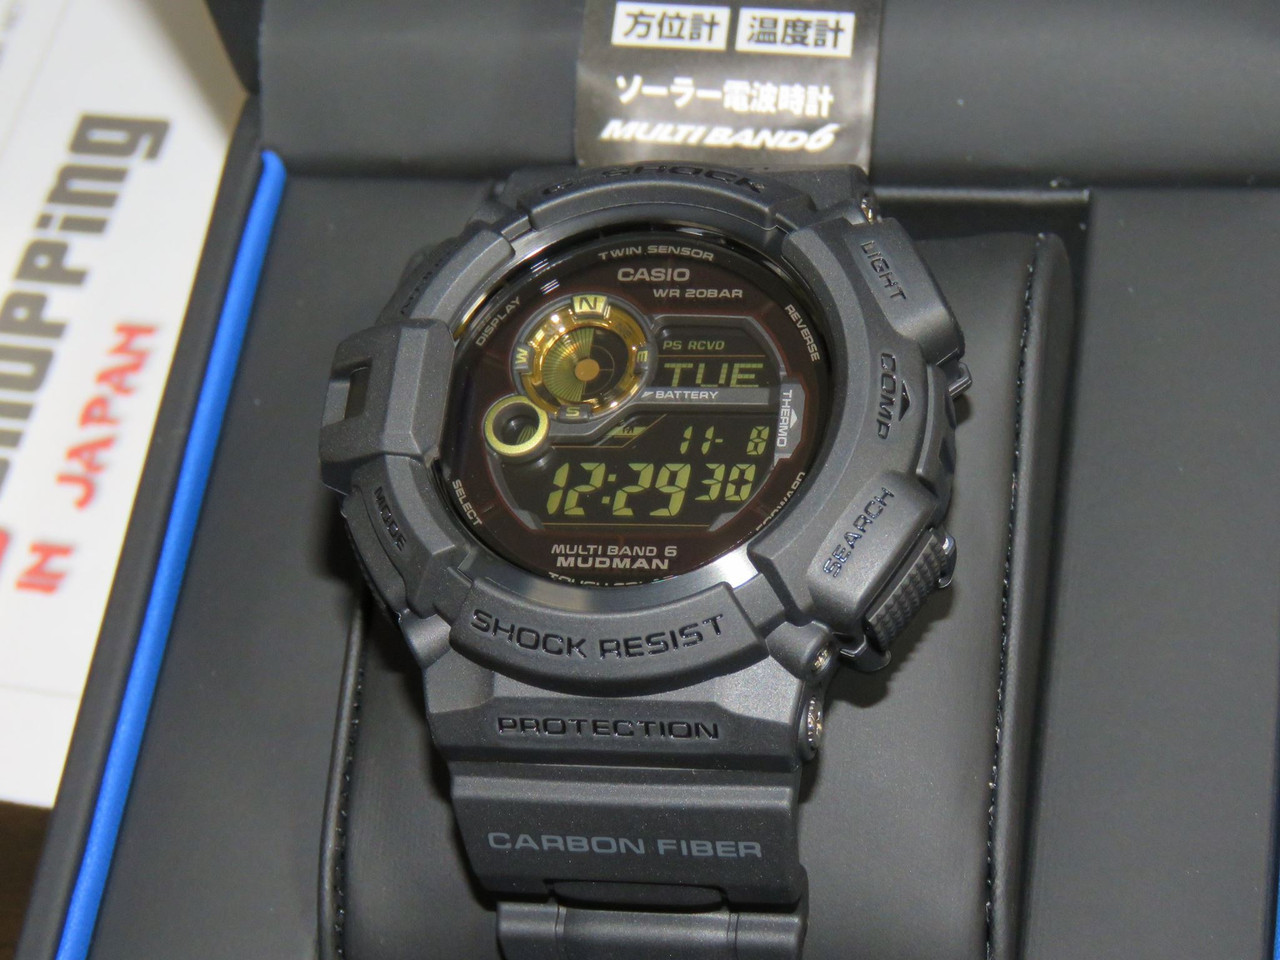 G-Shock Mudman GW-9300GB-1JF BLACK GOLD (Carbon)